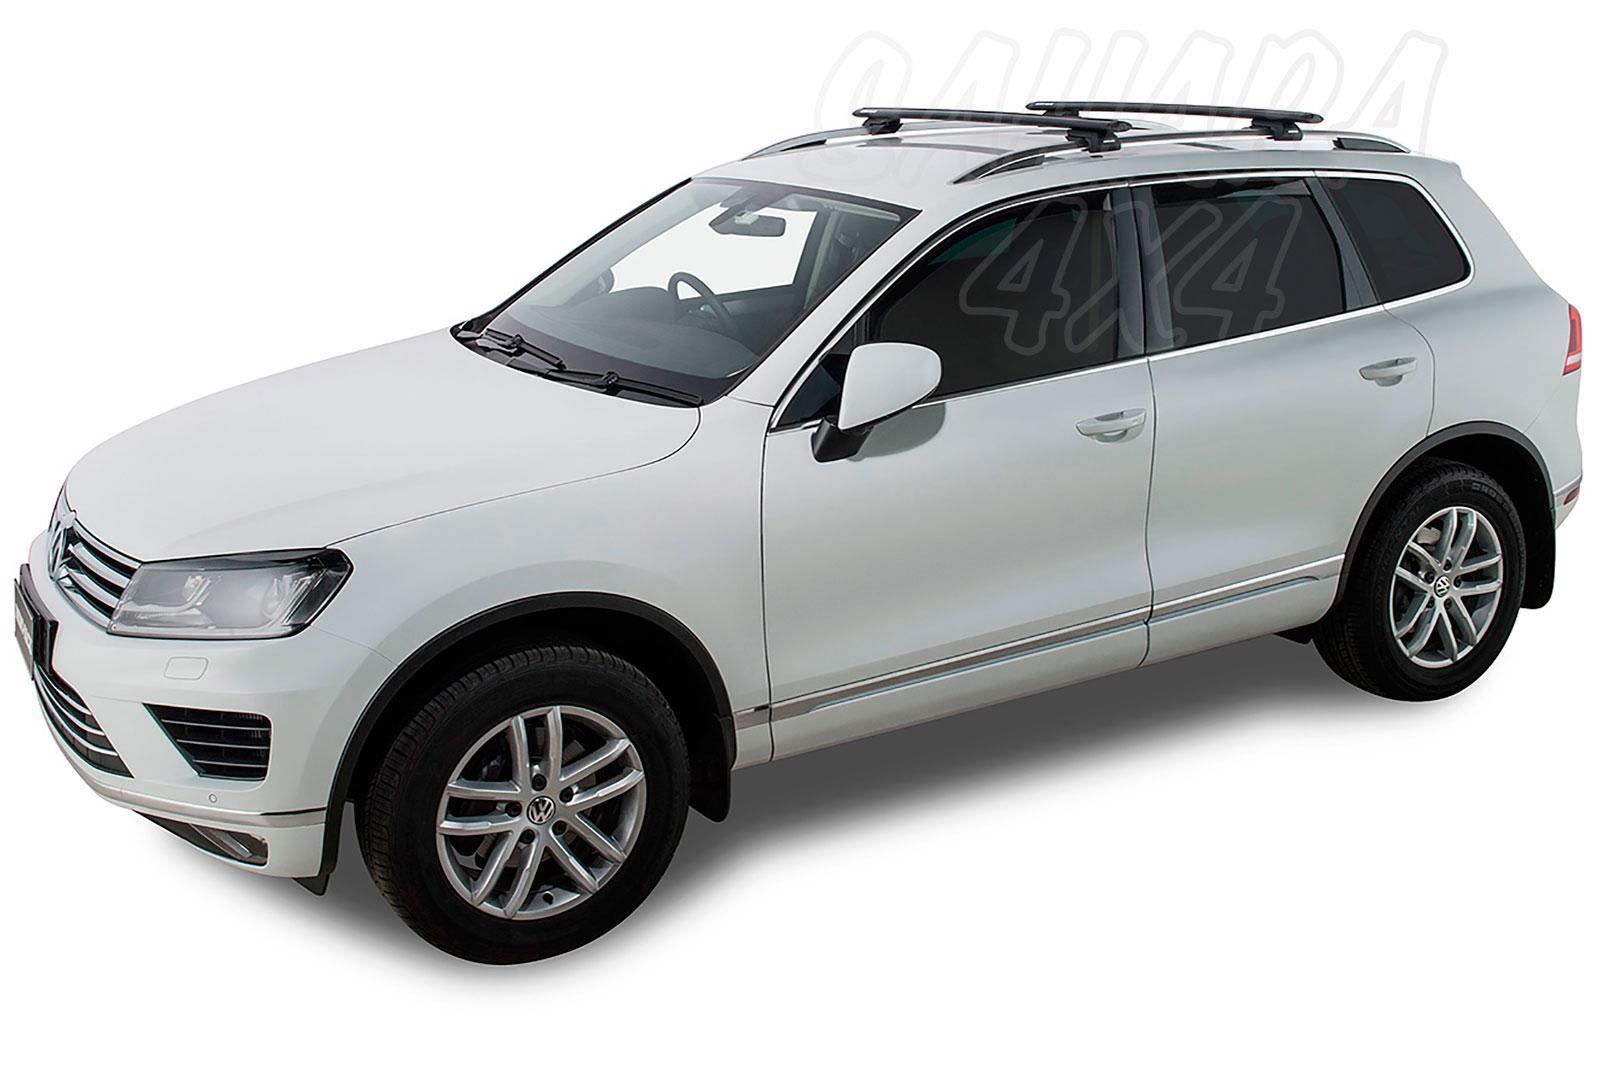 Rhino Rack Roof Bars Vortex Sx For Volkswagen Touareg 2011 2017 Fuse Box Location Railing Bar Kit Max Load 80kg